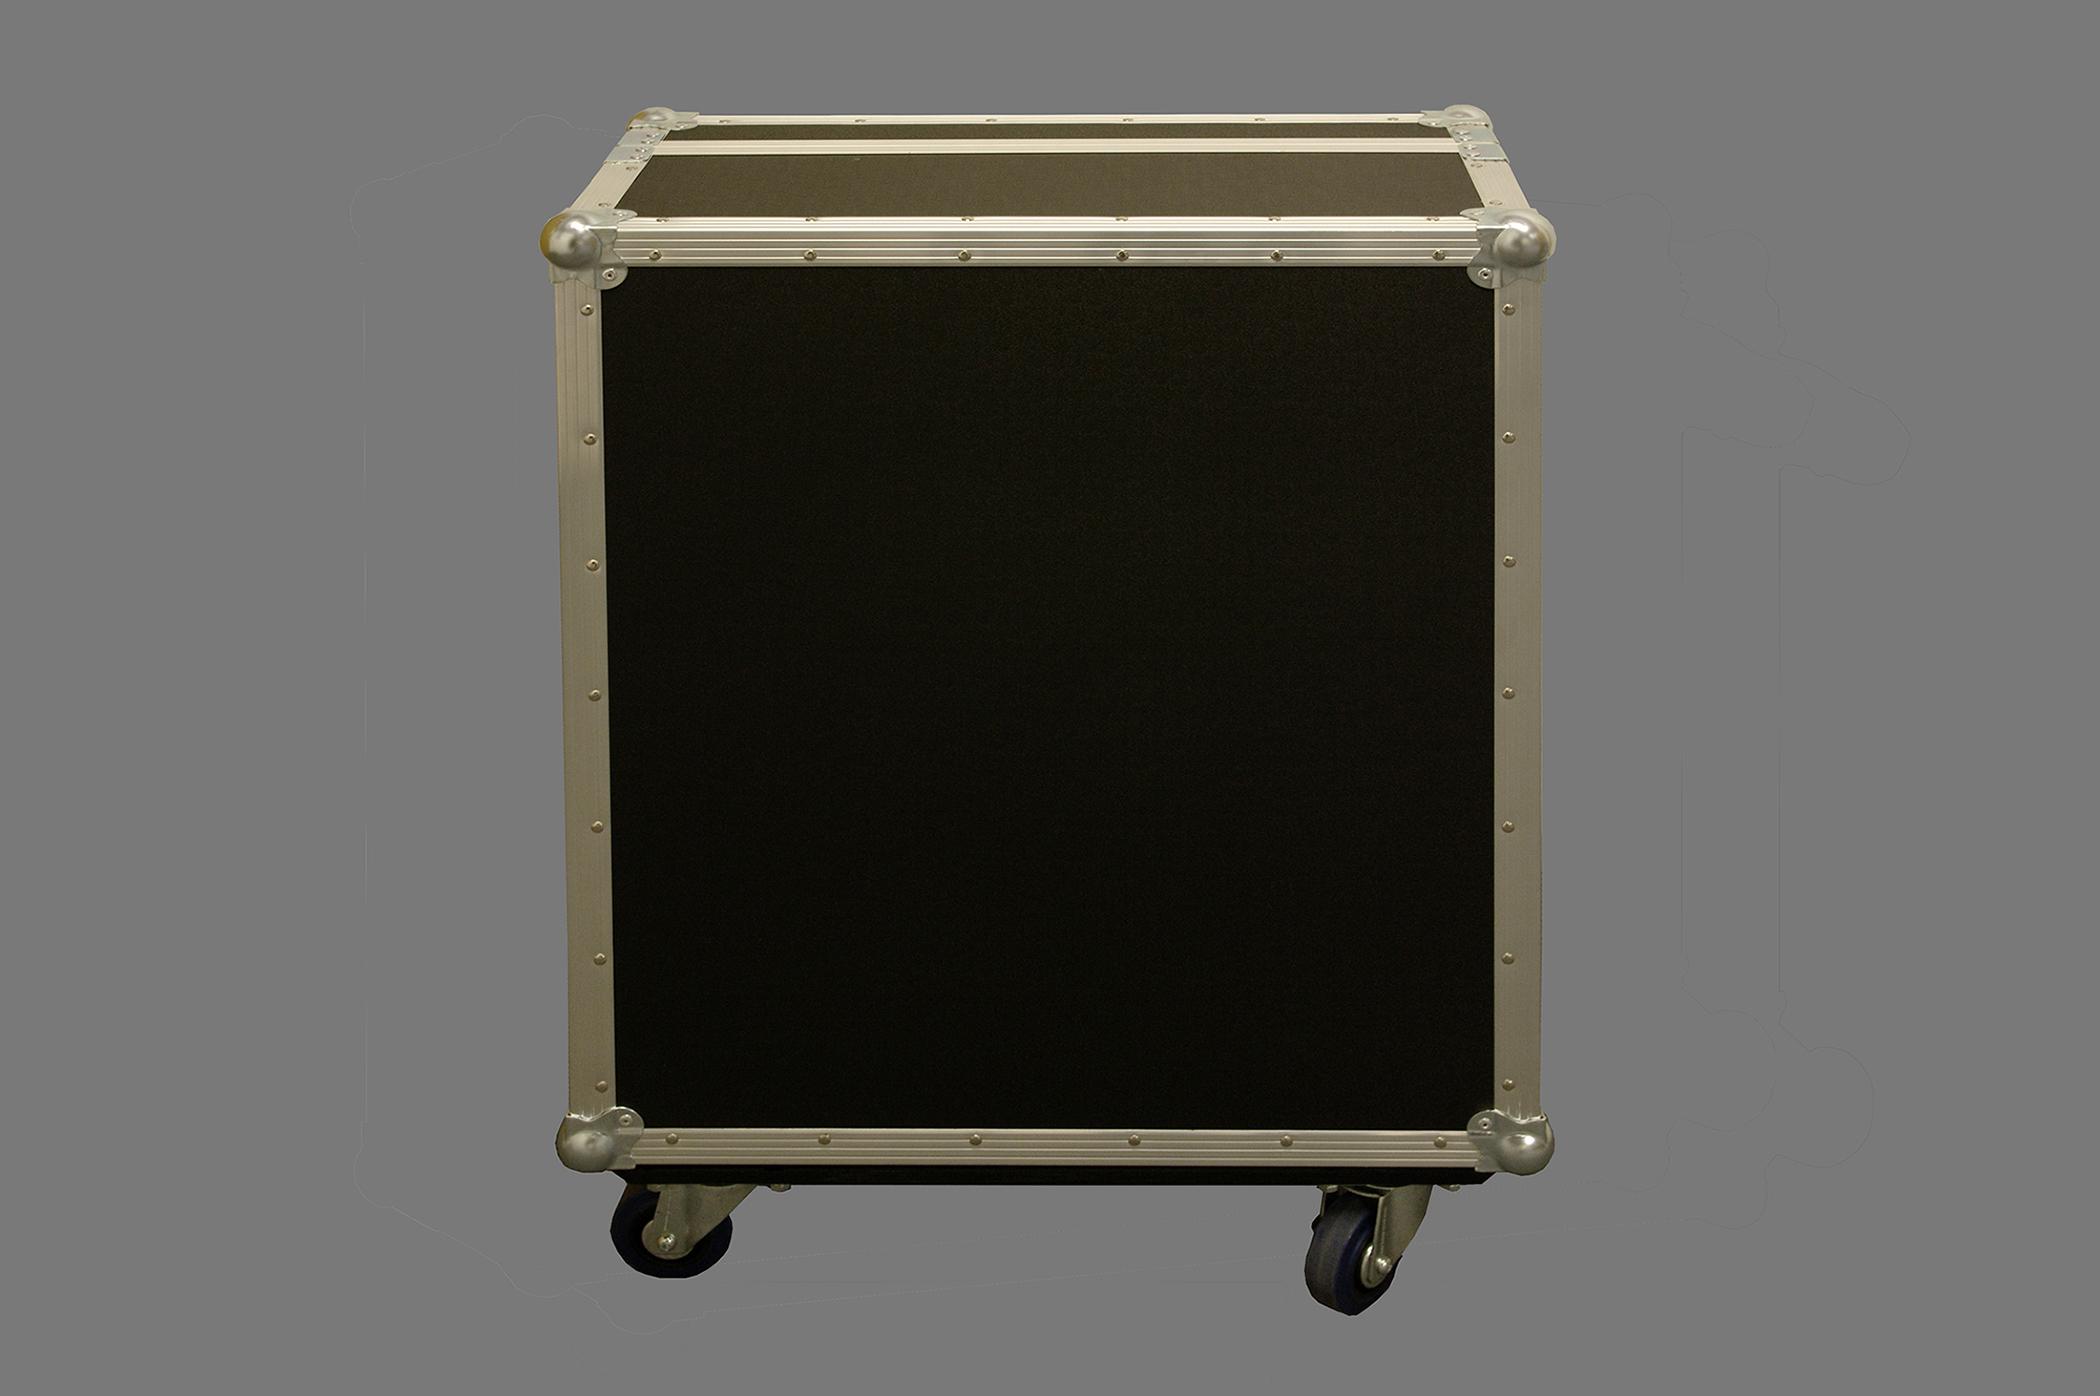 Panasonic projector case_01